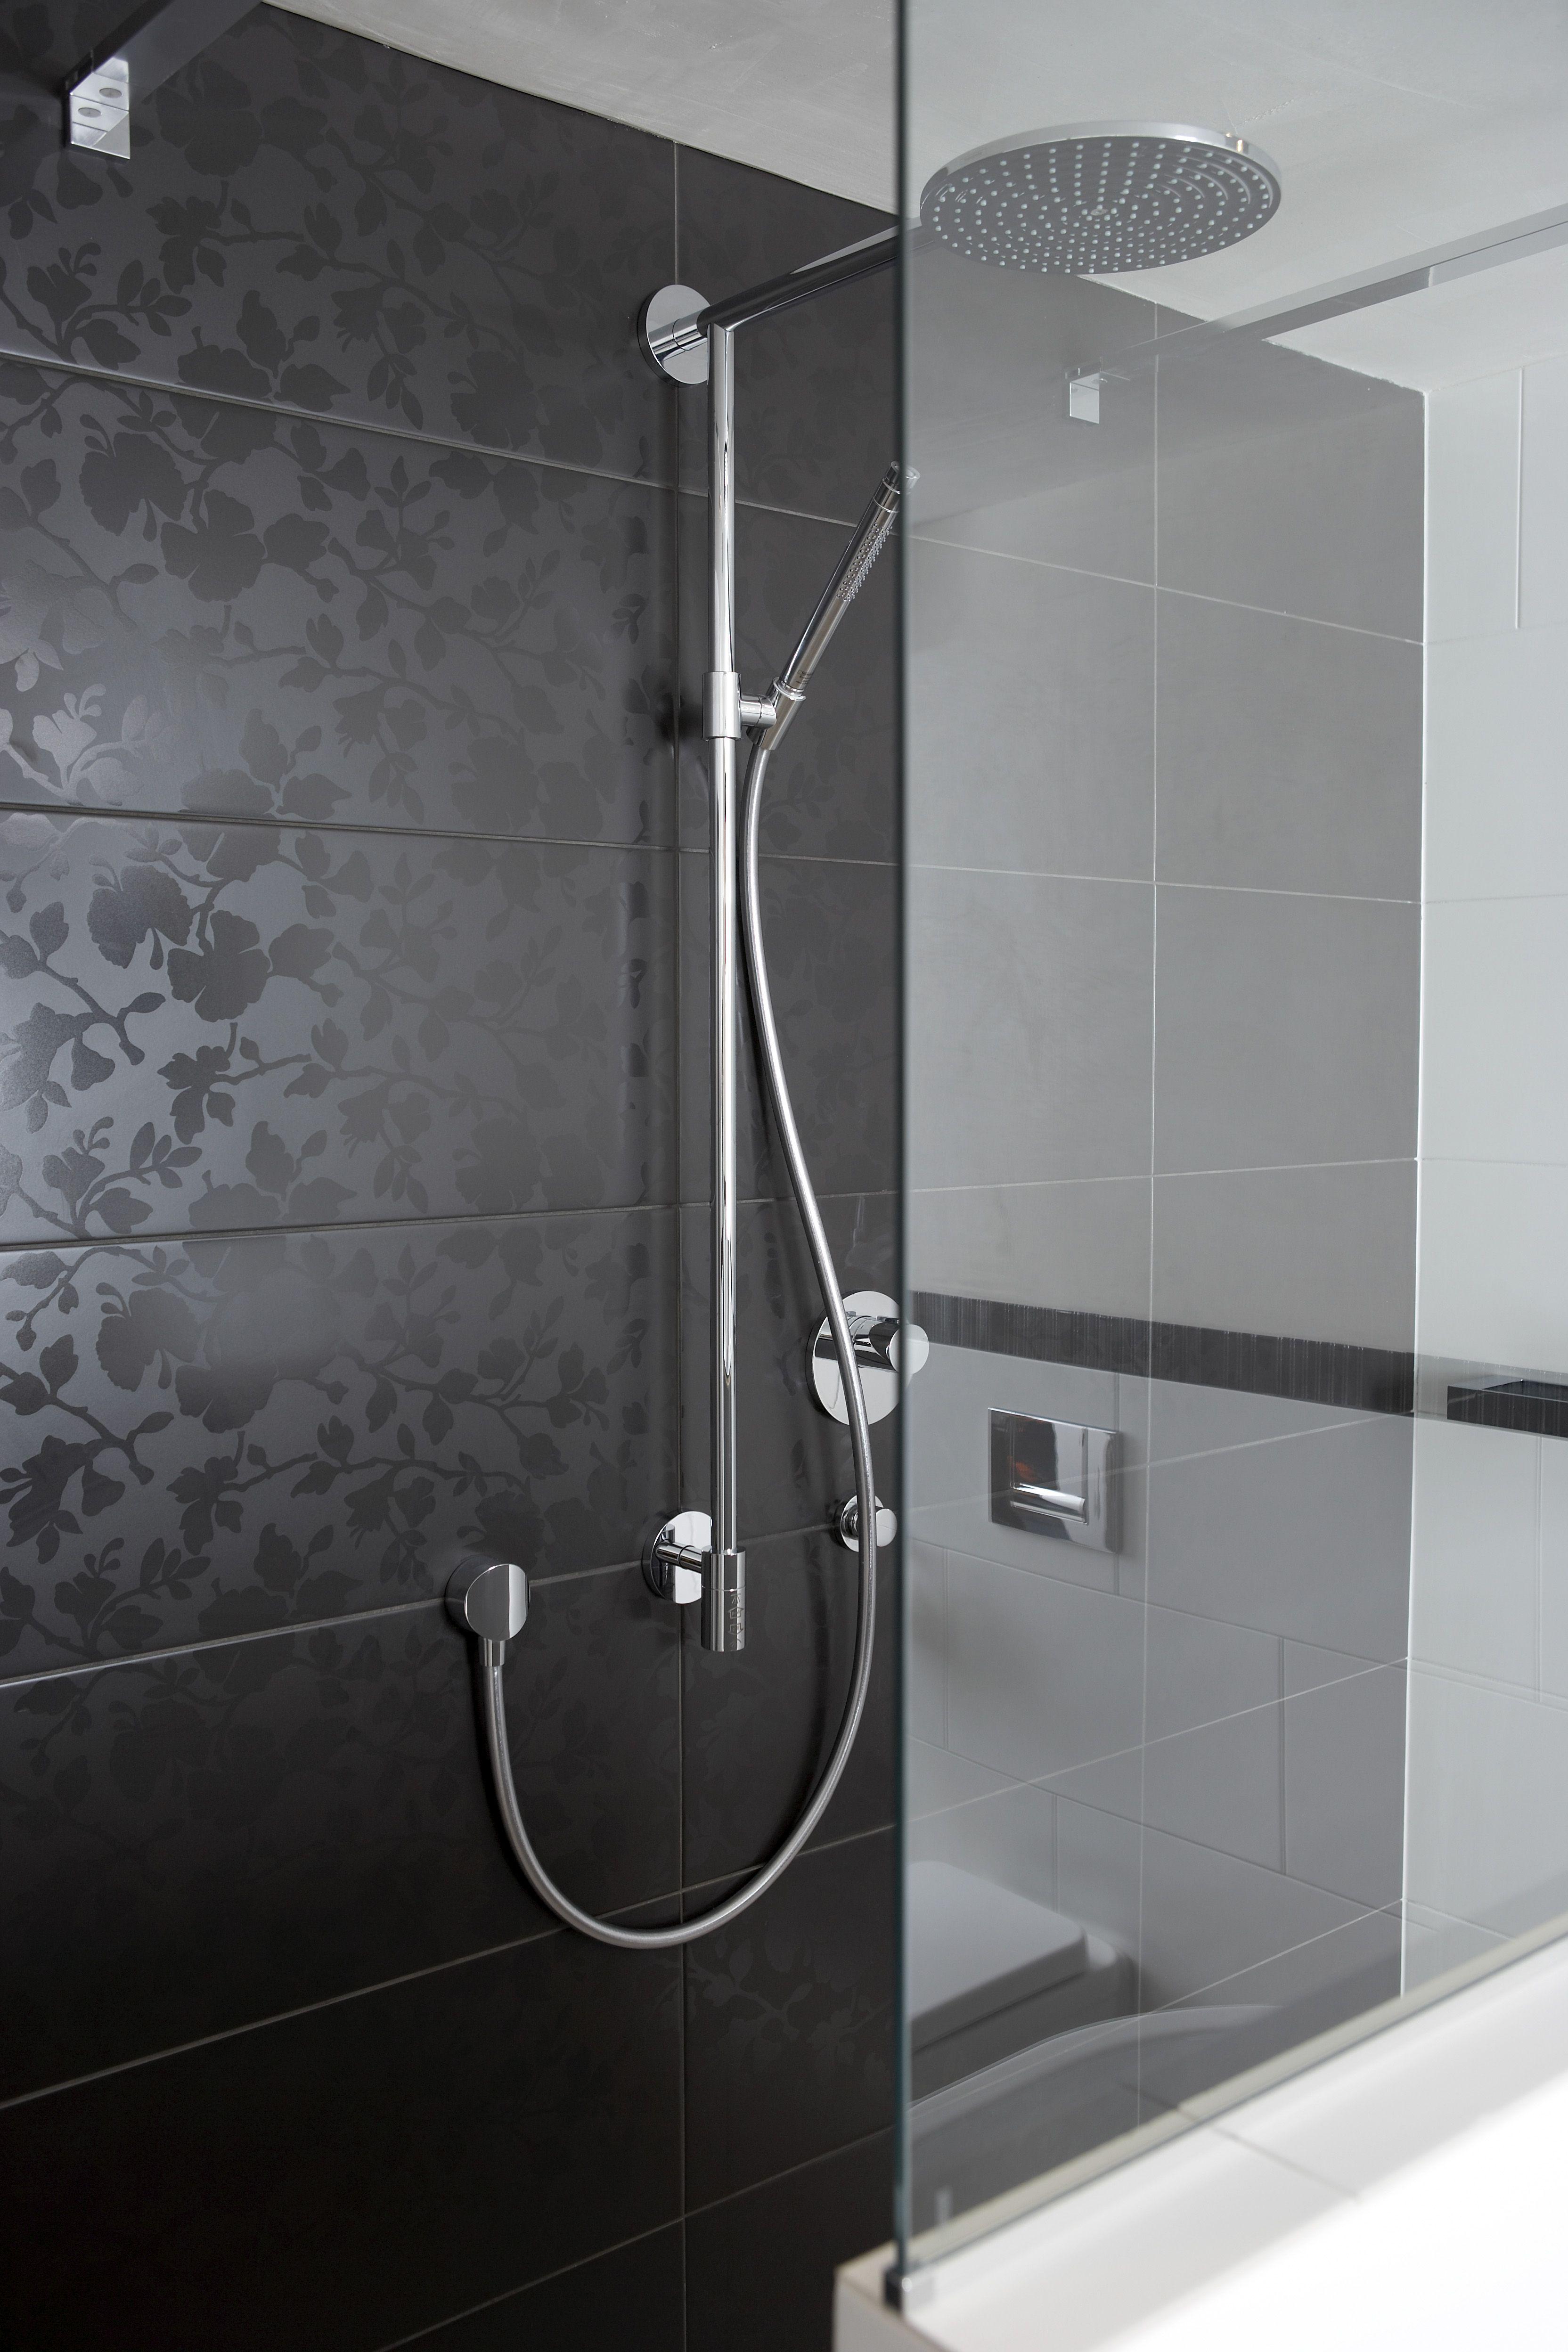 Baderie Boer Staphorst - mooie tegels!   badkamer / bathroom   Pinterest